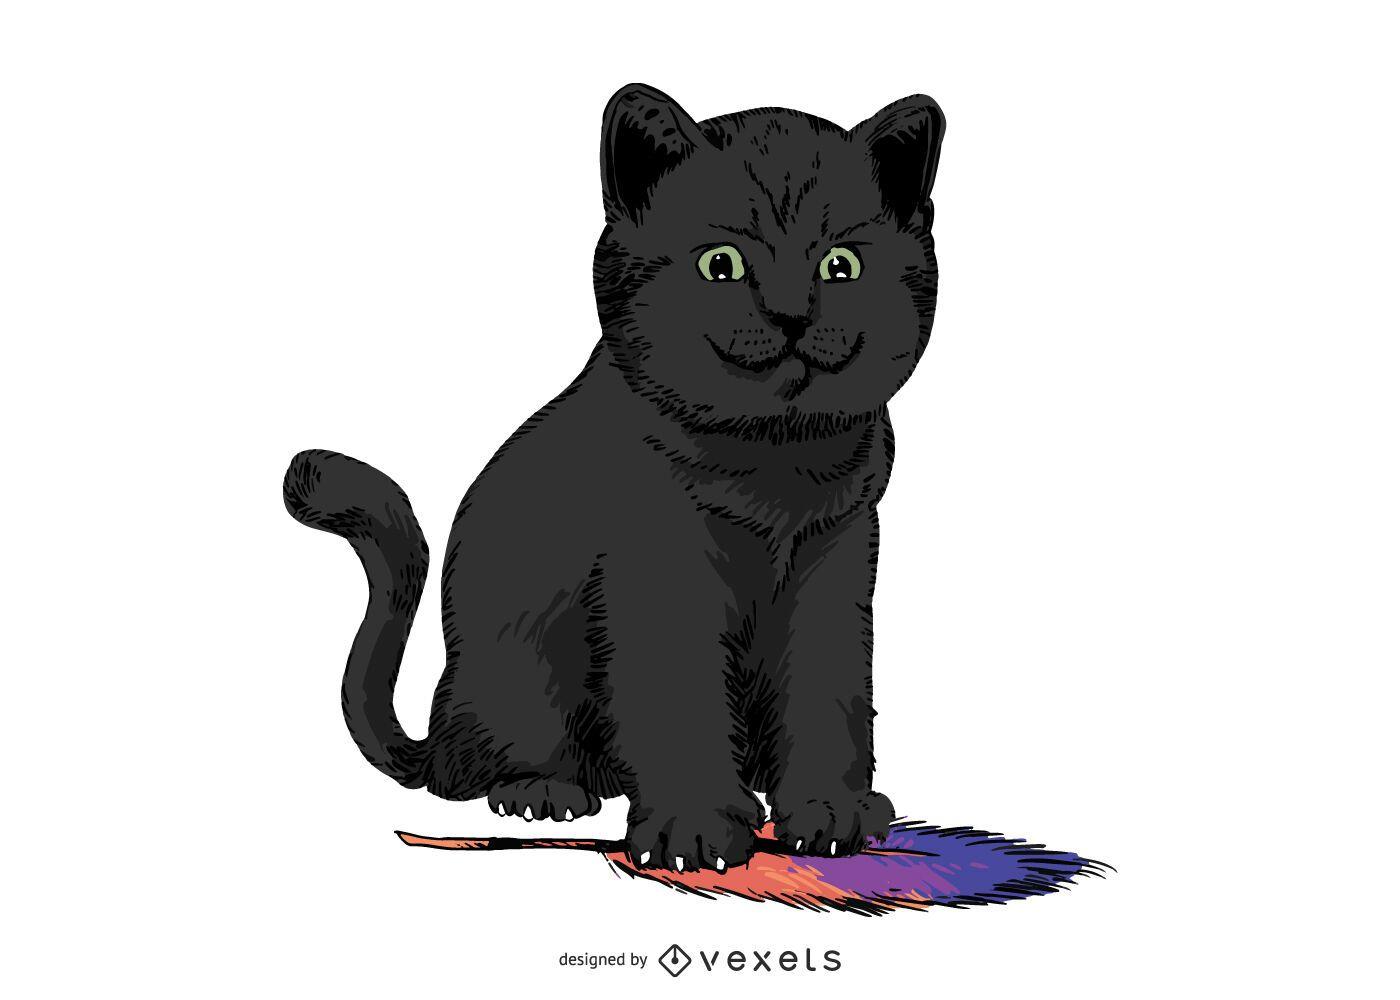 Black cat feather illustration design